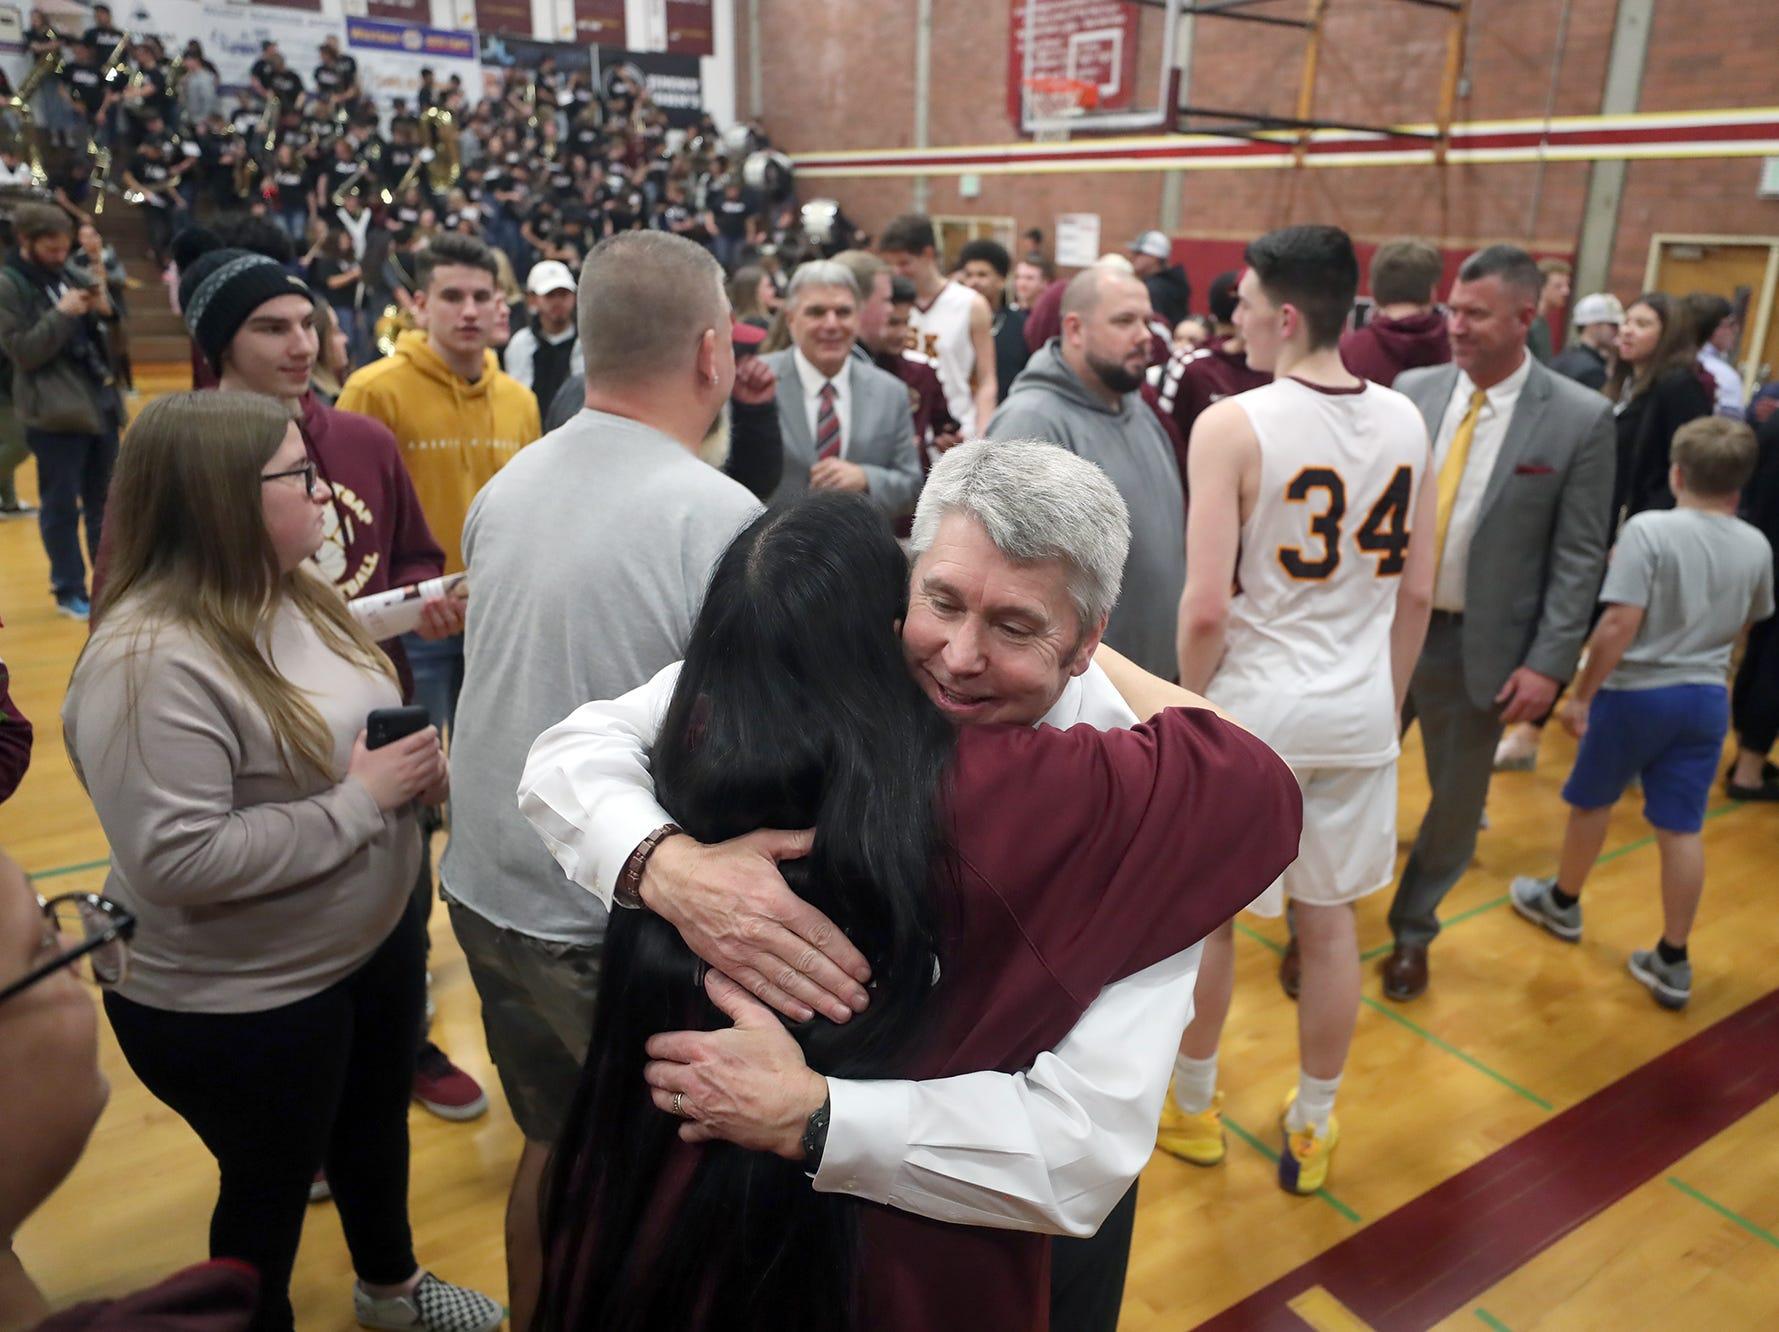 South Kitsap High School varsity head basketball coach John Callaghan won his 300th game against Bellarmine at South Kitsap on Thursday, January 17, 2019. Callaghan gets hugs after the game.